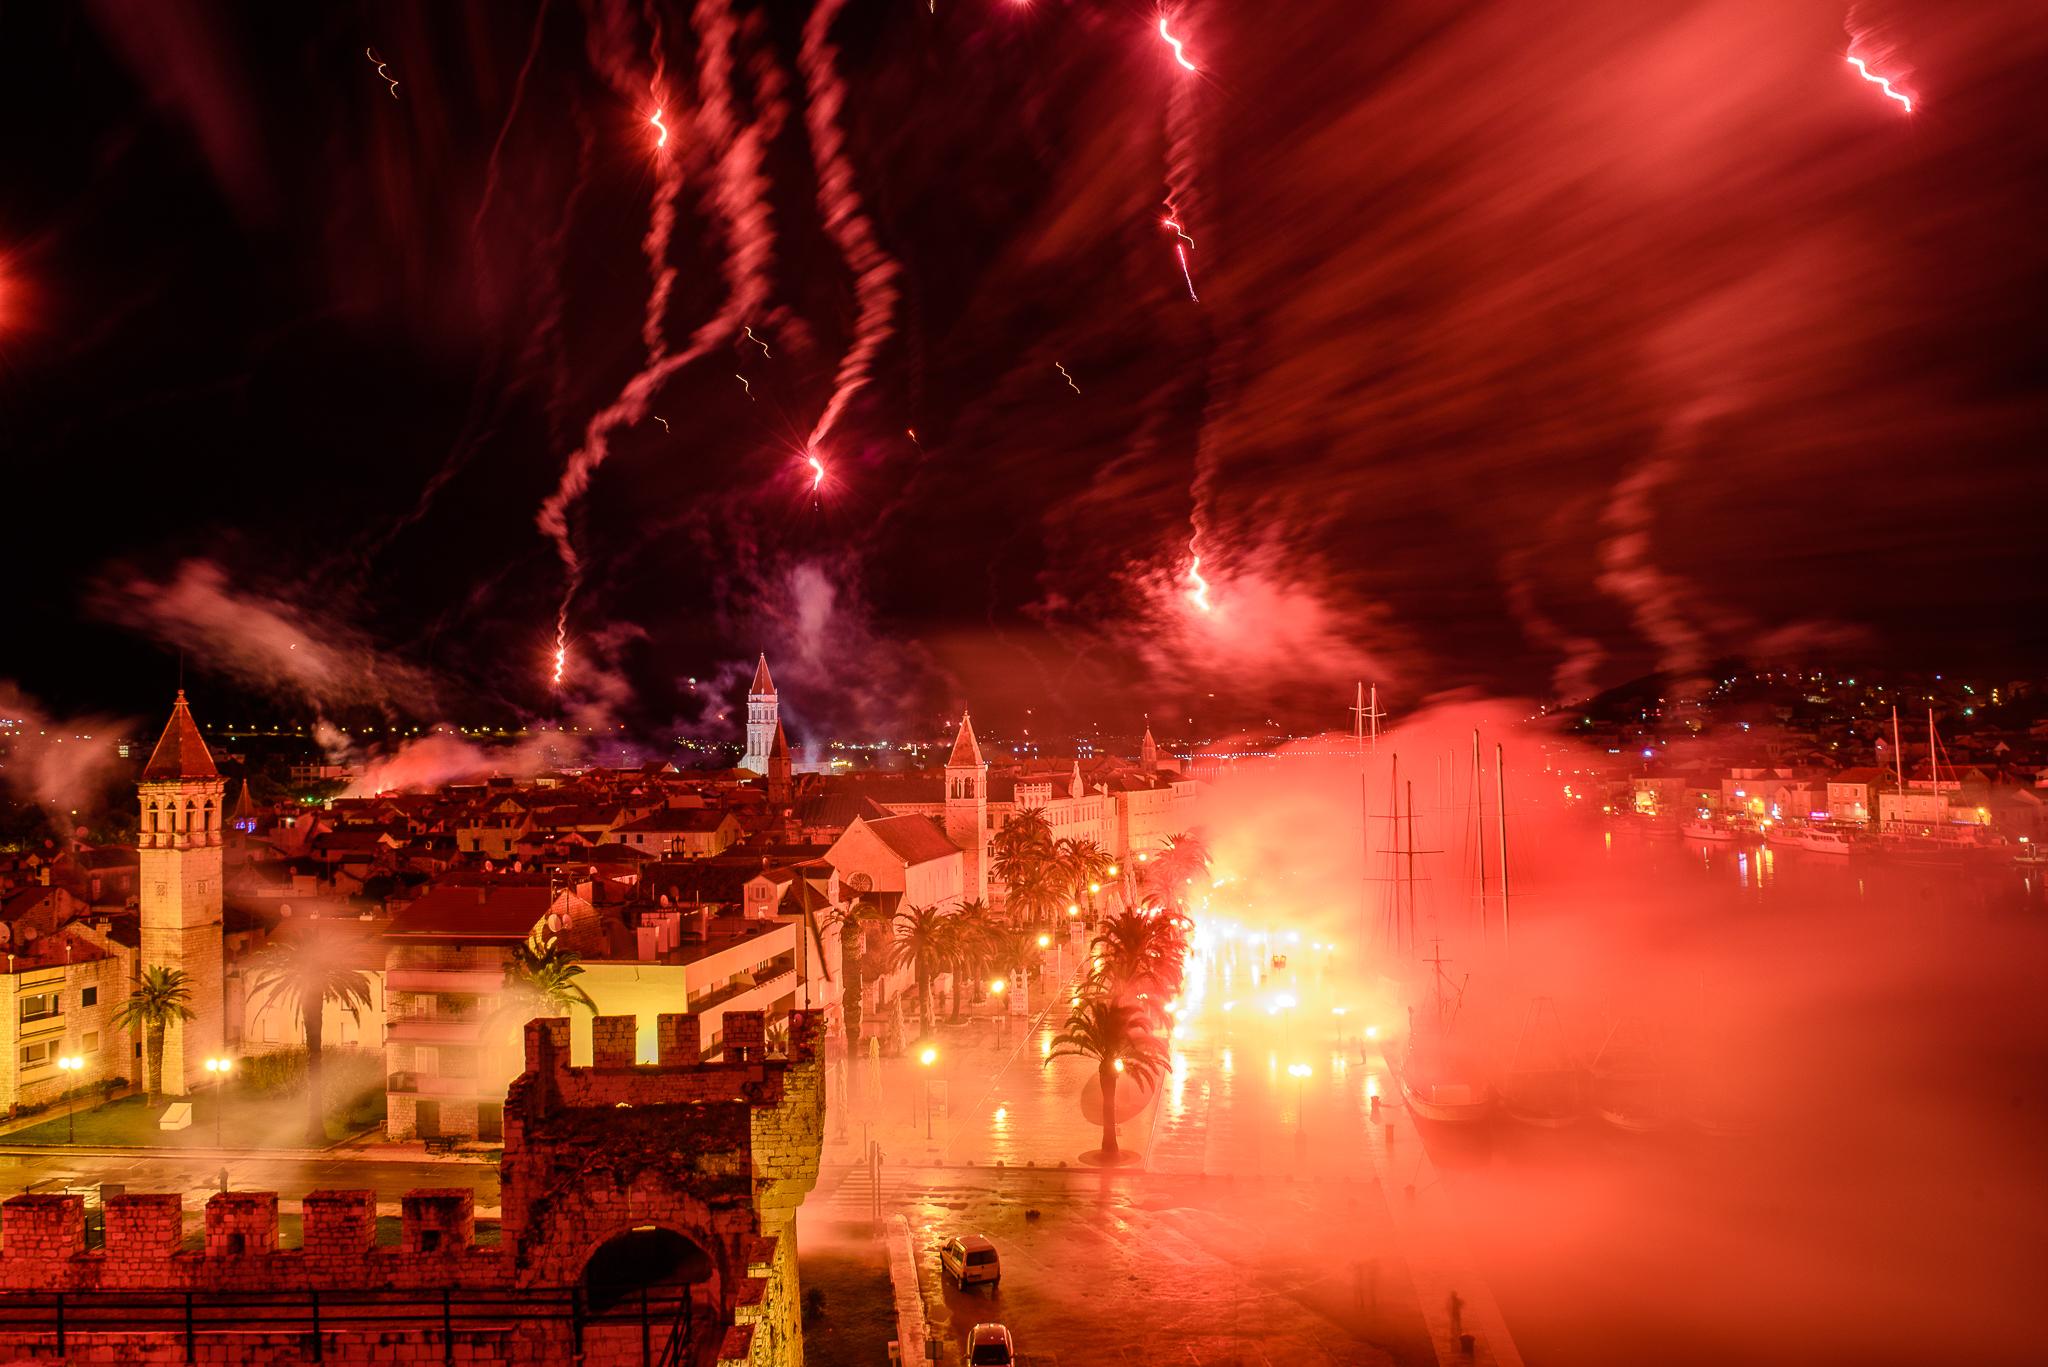 Proslava Torcidinog rođendana u Trogiru | foto: Antonio Miše i Deni Lokas